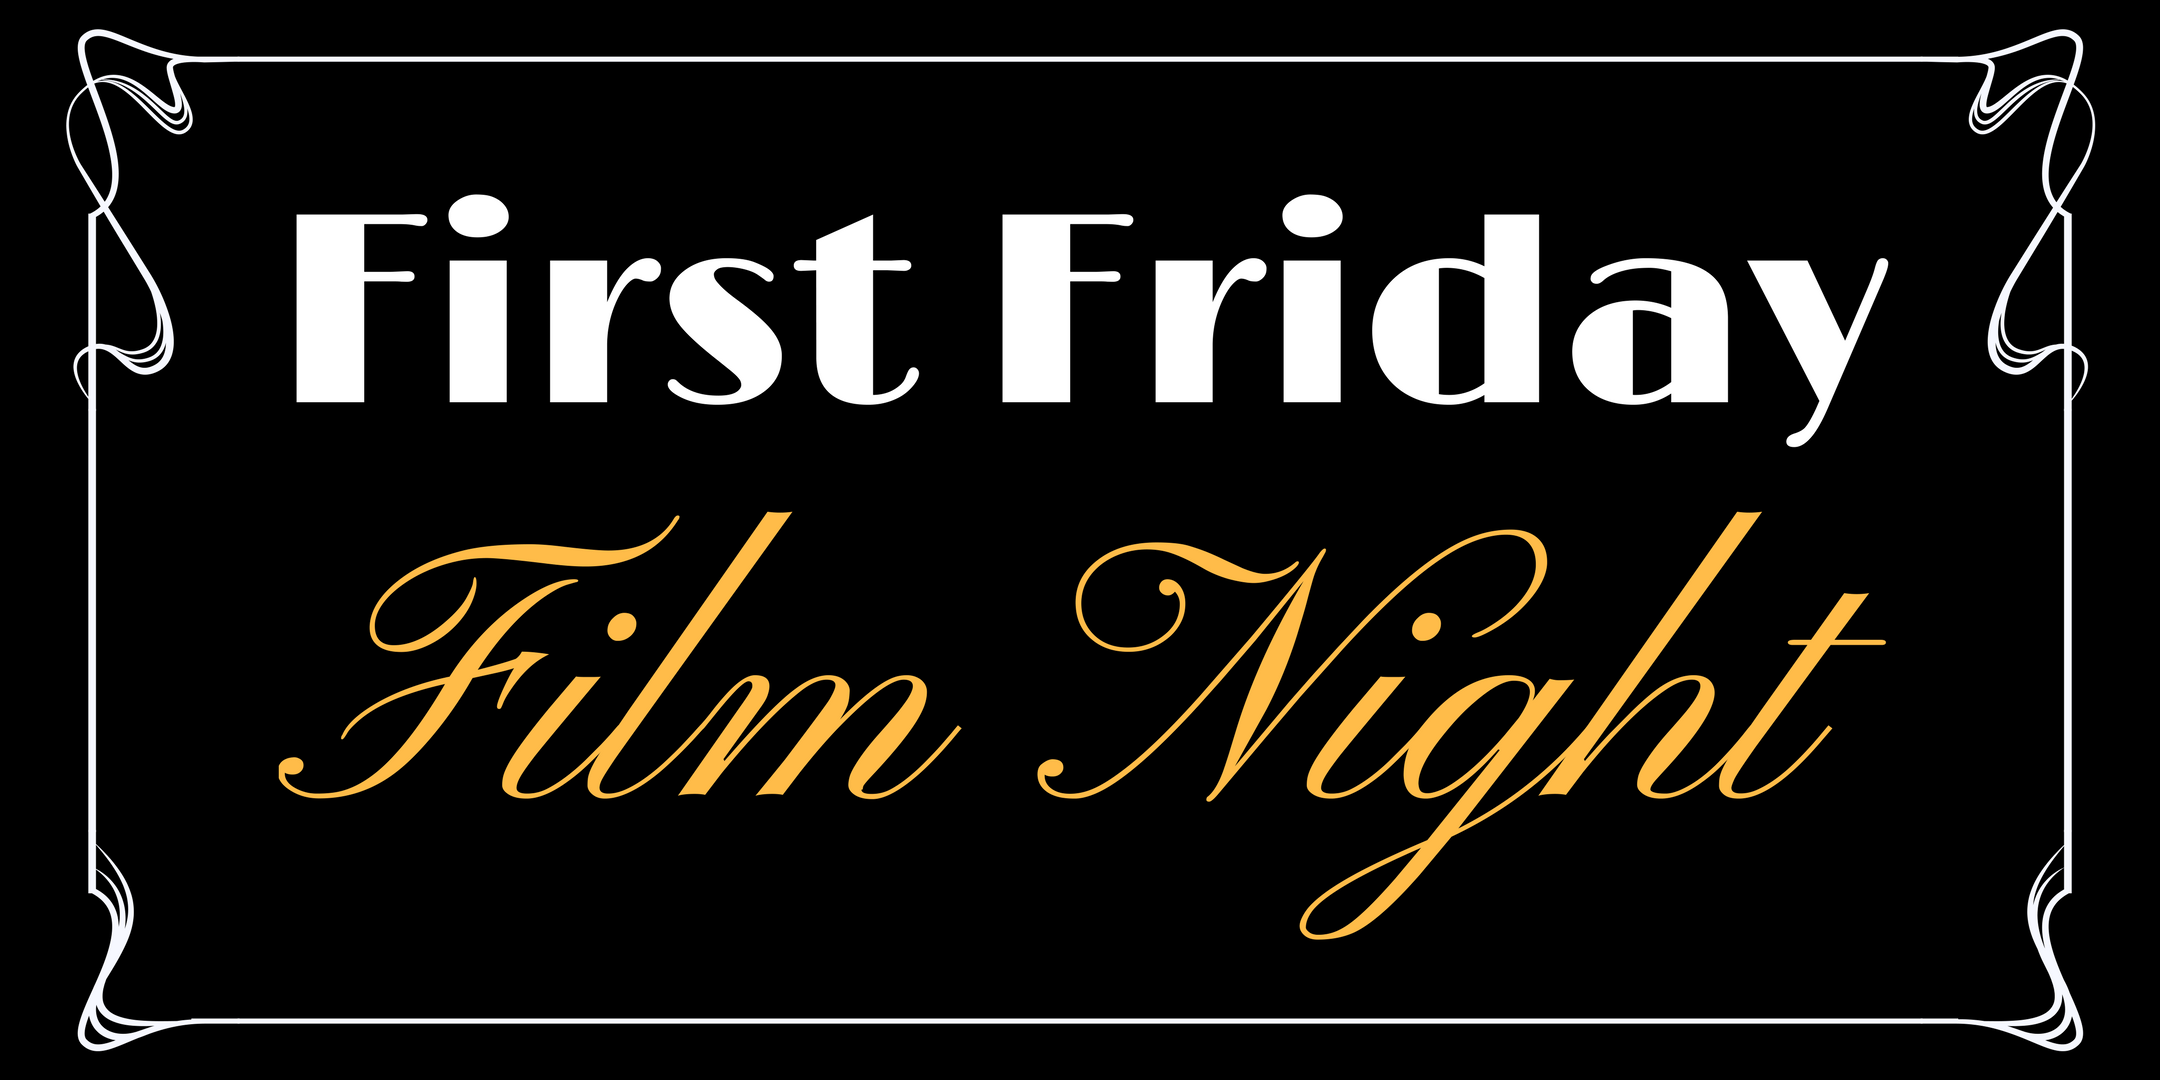 First Friday Film Night